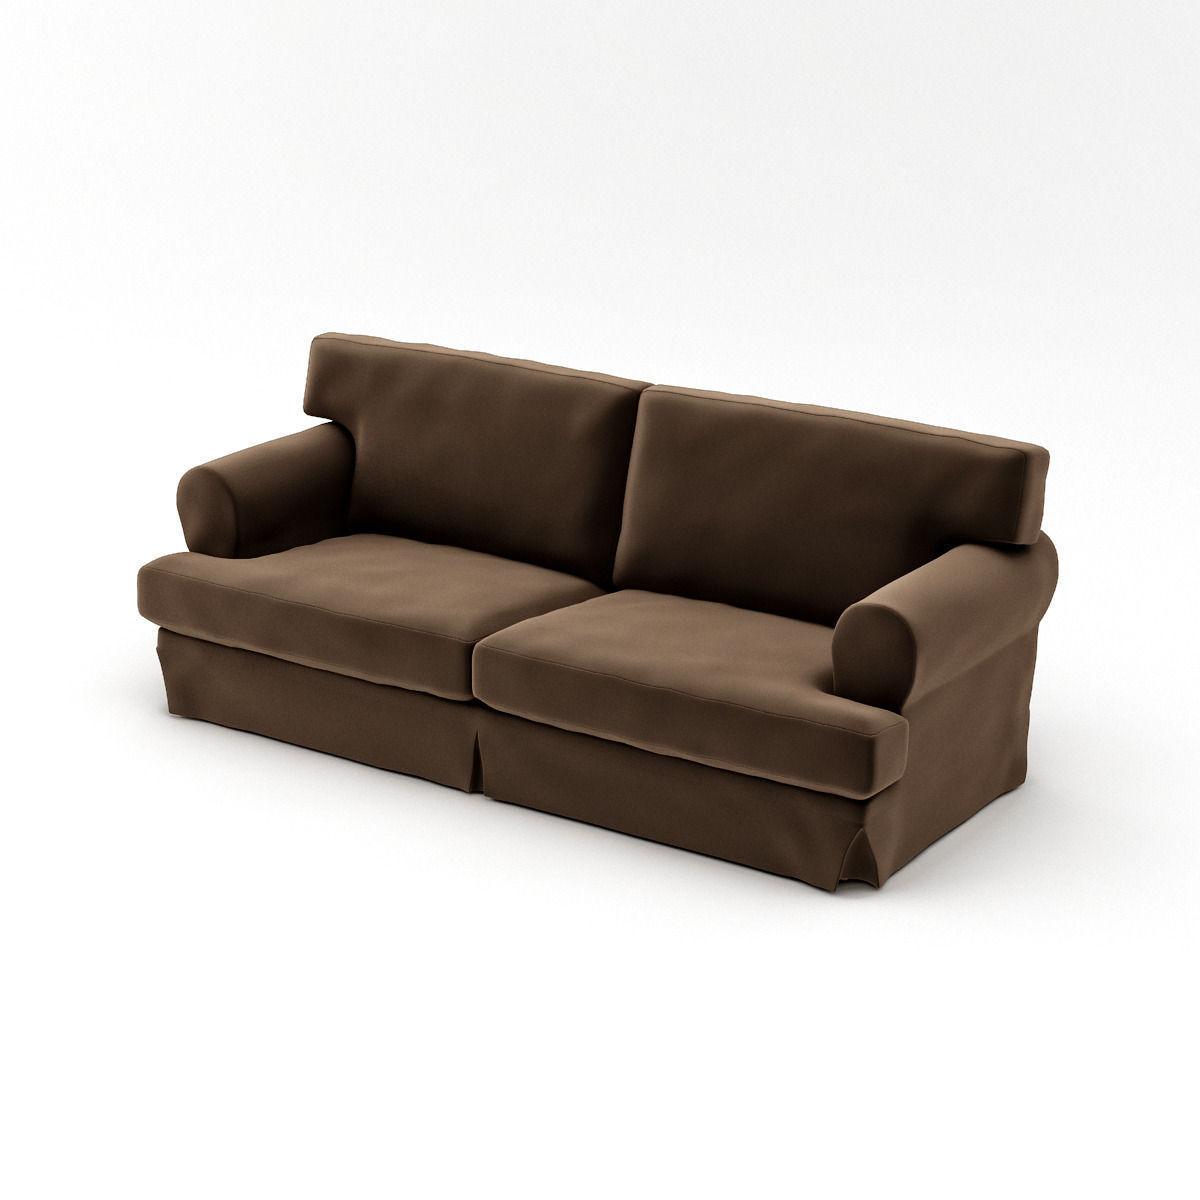 ikea ekeskog sofa for sale living room furniture dark grey sofas 3d model max cgtrader